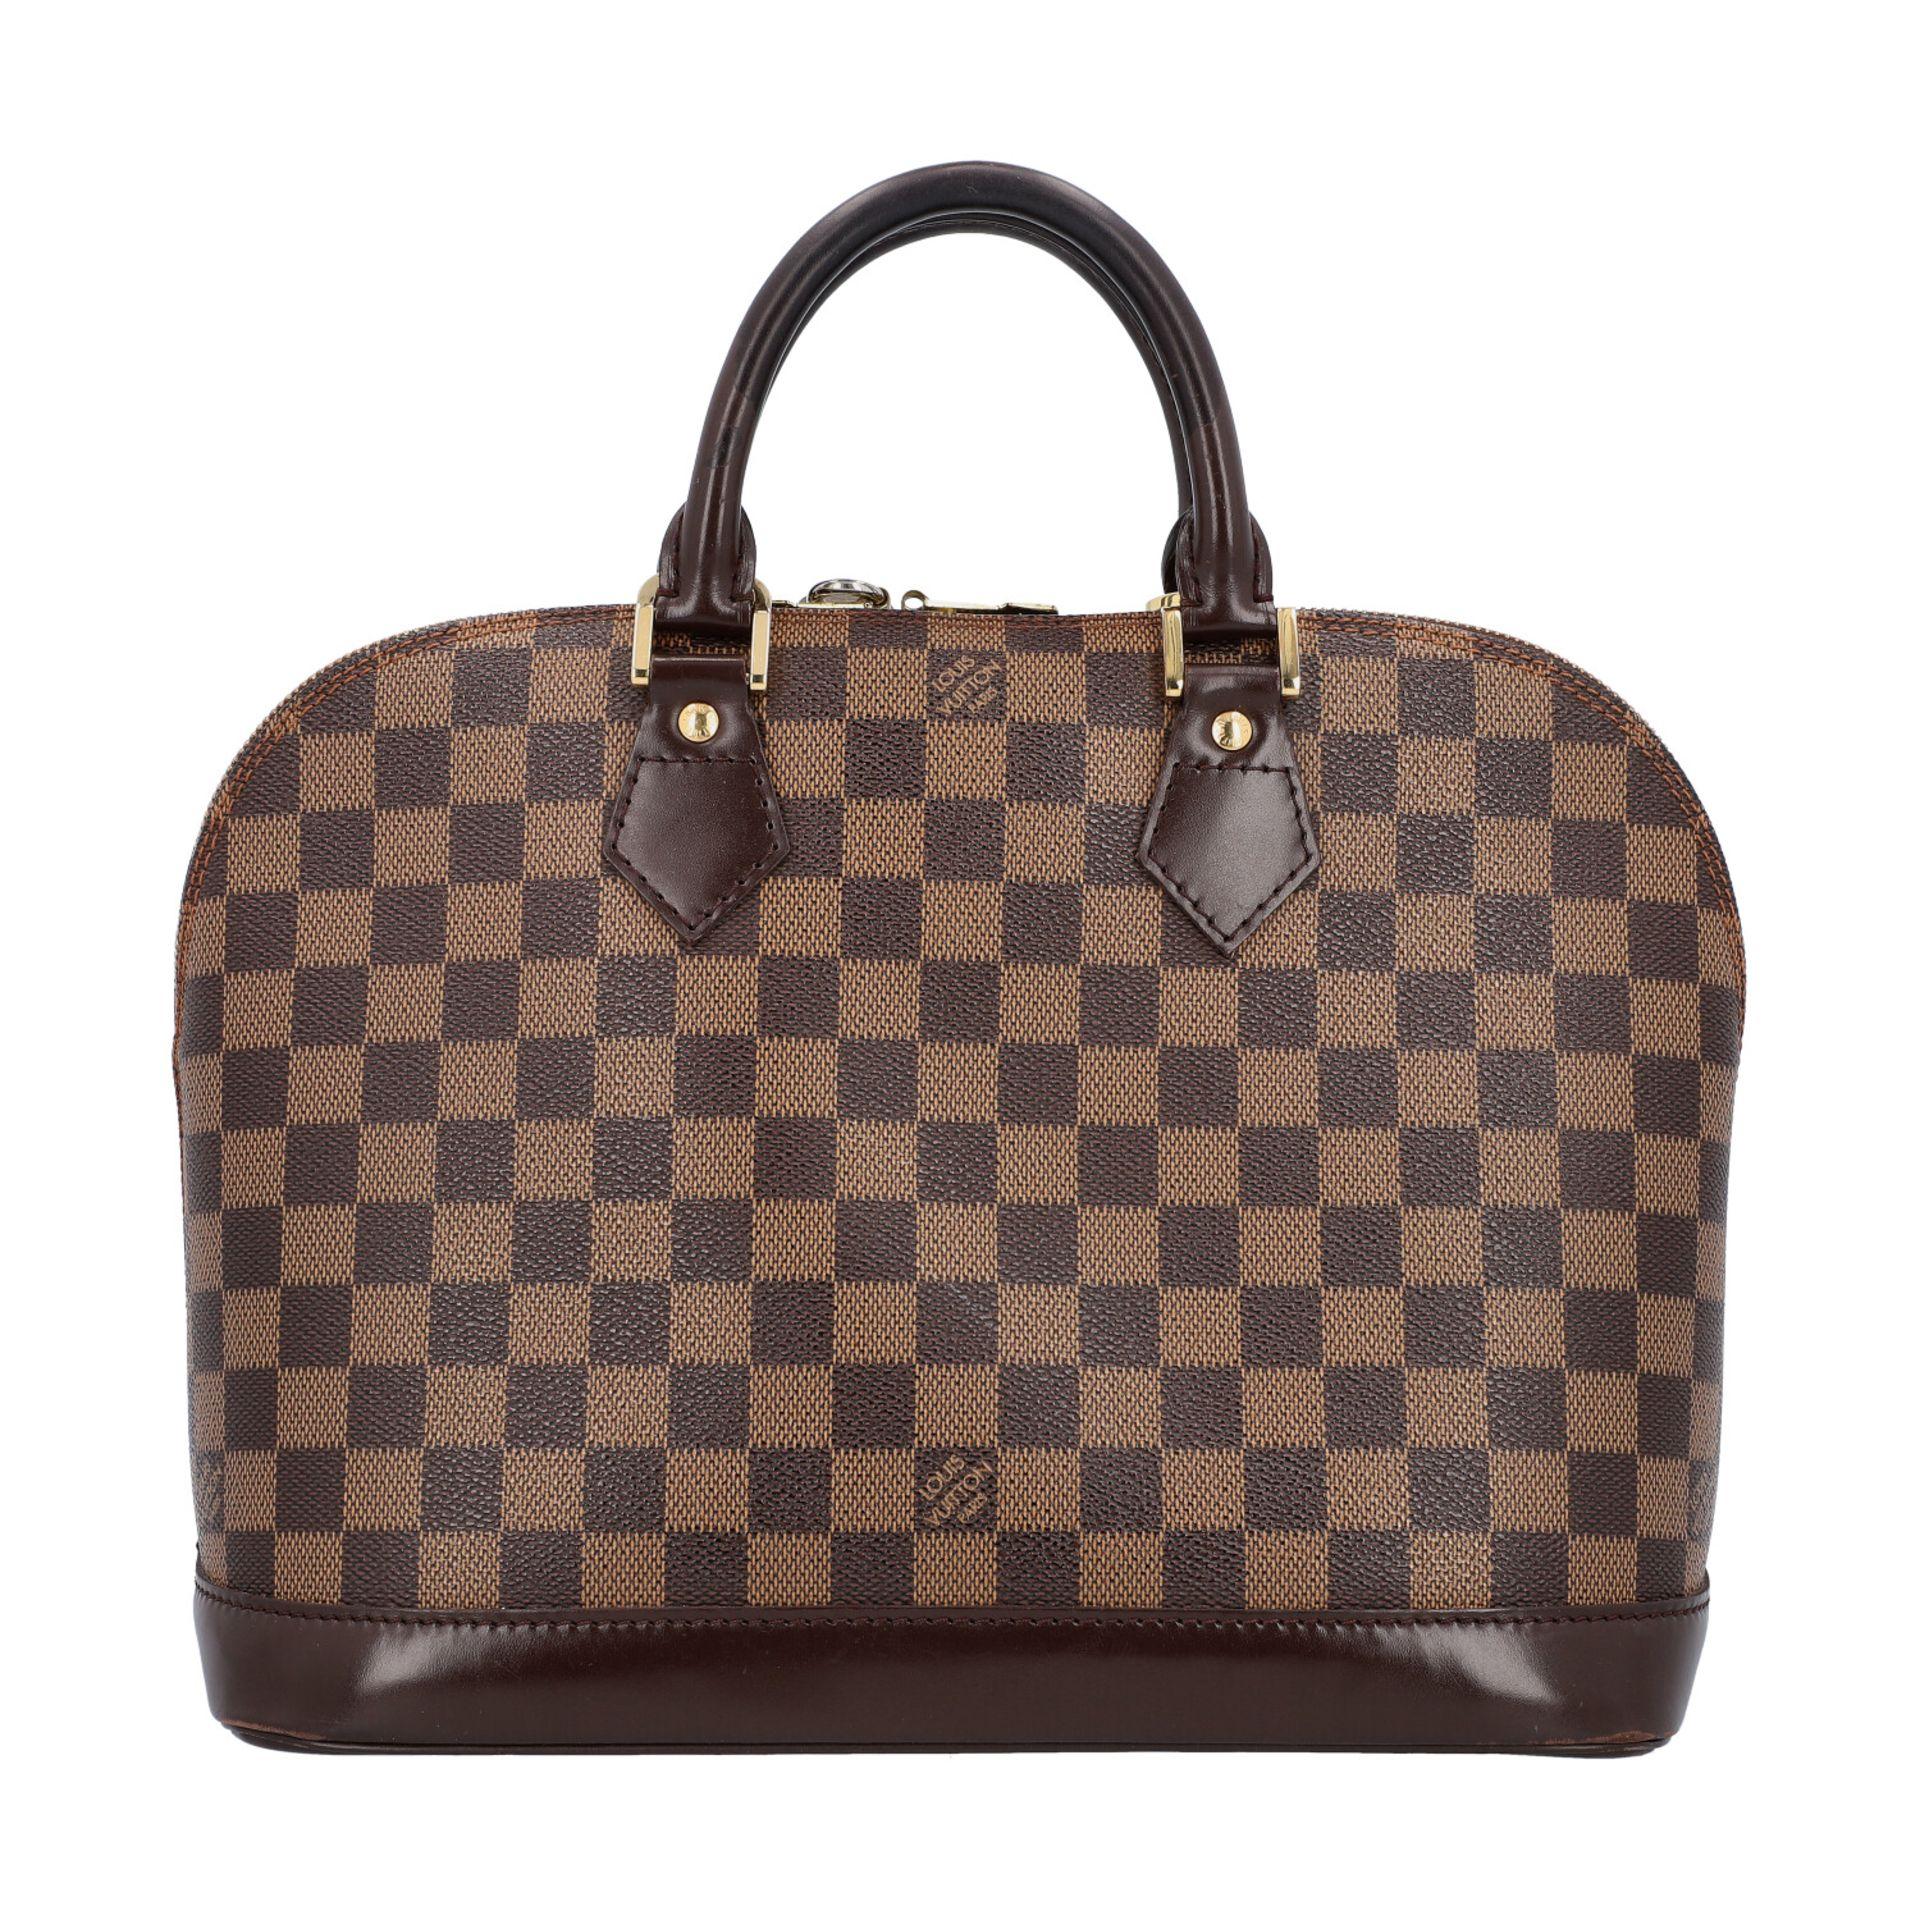 "LOUIS VUITTON Handtasche ""ALMA PM"", Koll. 2004. Akt. NP.: 1.250,-€. Damier Ebene Can"